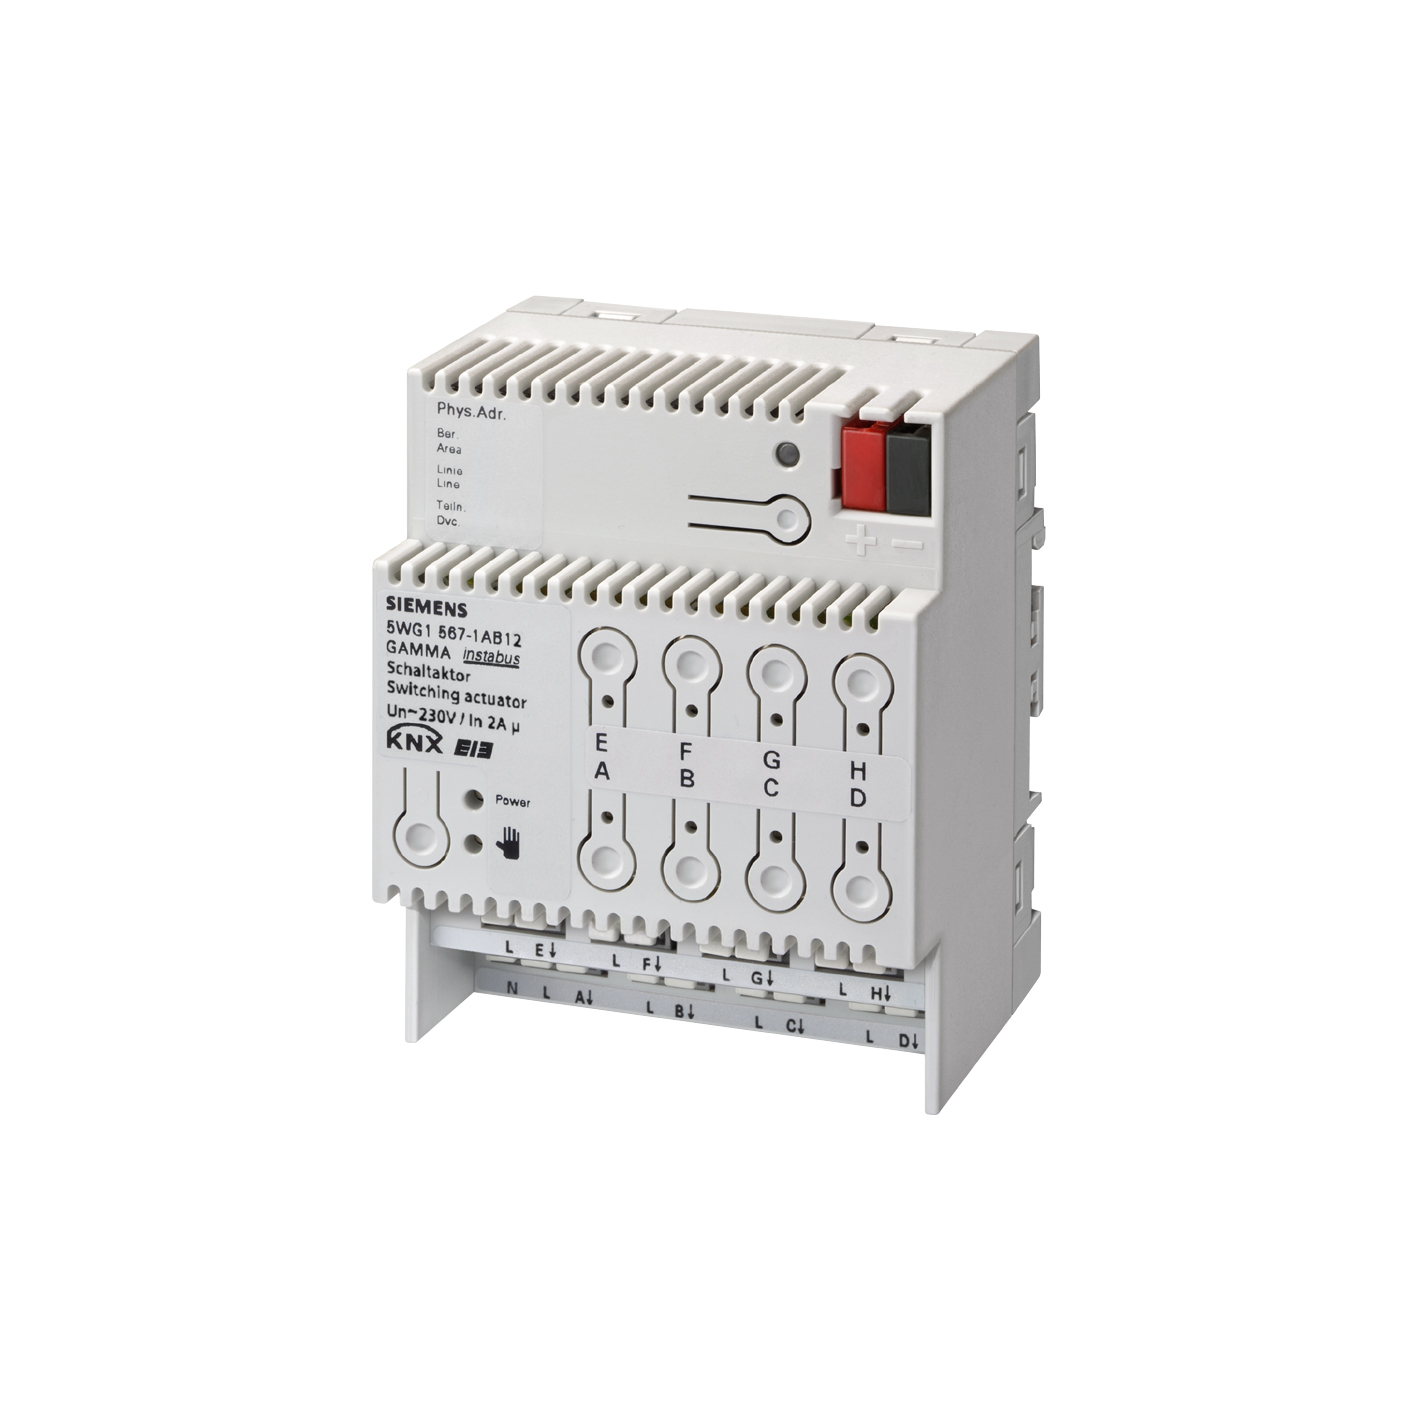 1 Stk Schaltaktor 8 x AC 230 V, 2 A KX5671AB12